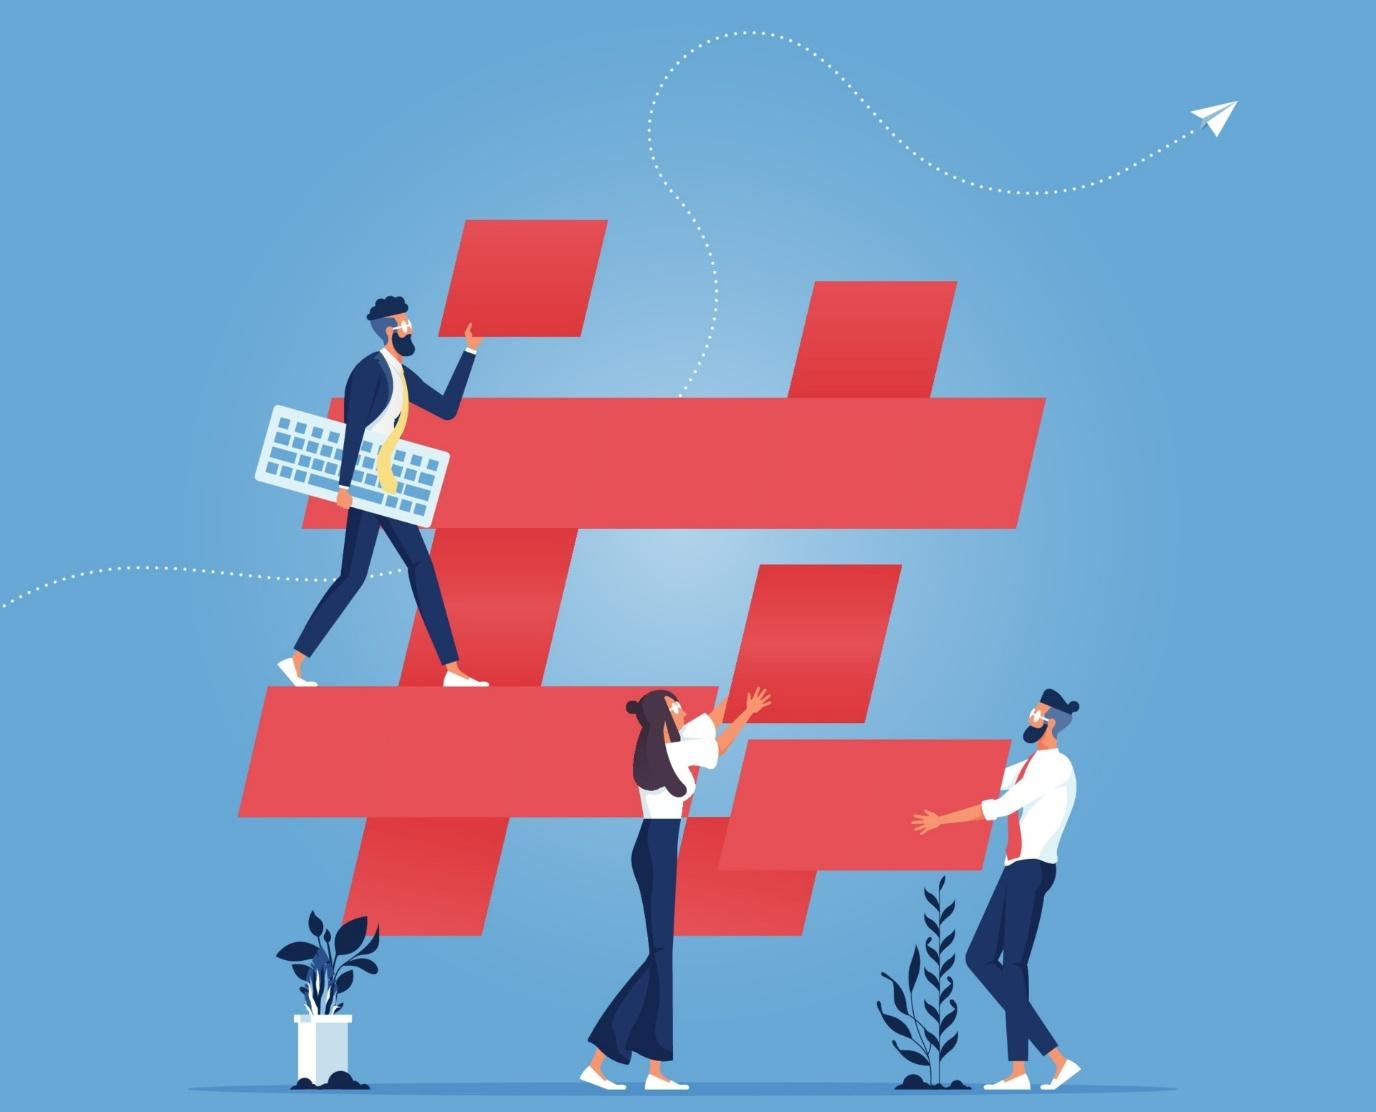 C:\Users\MohammaD\Desktop\people-build-hashtag-icon-social-media-concept-vector.jpg